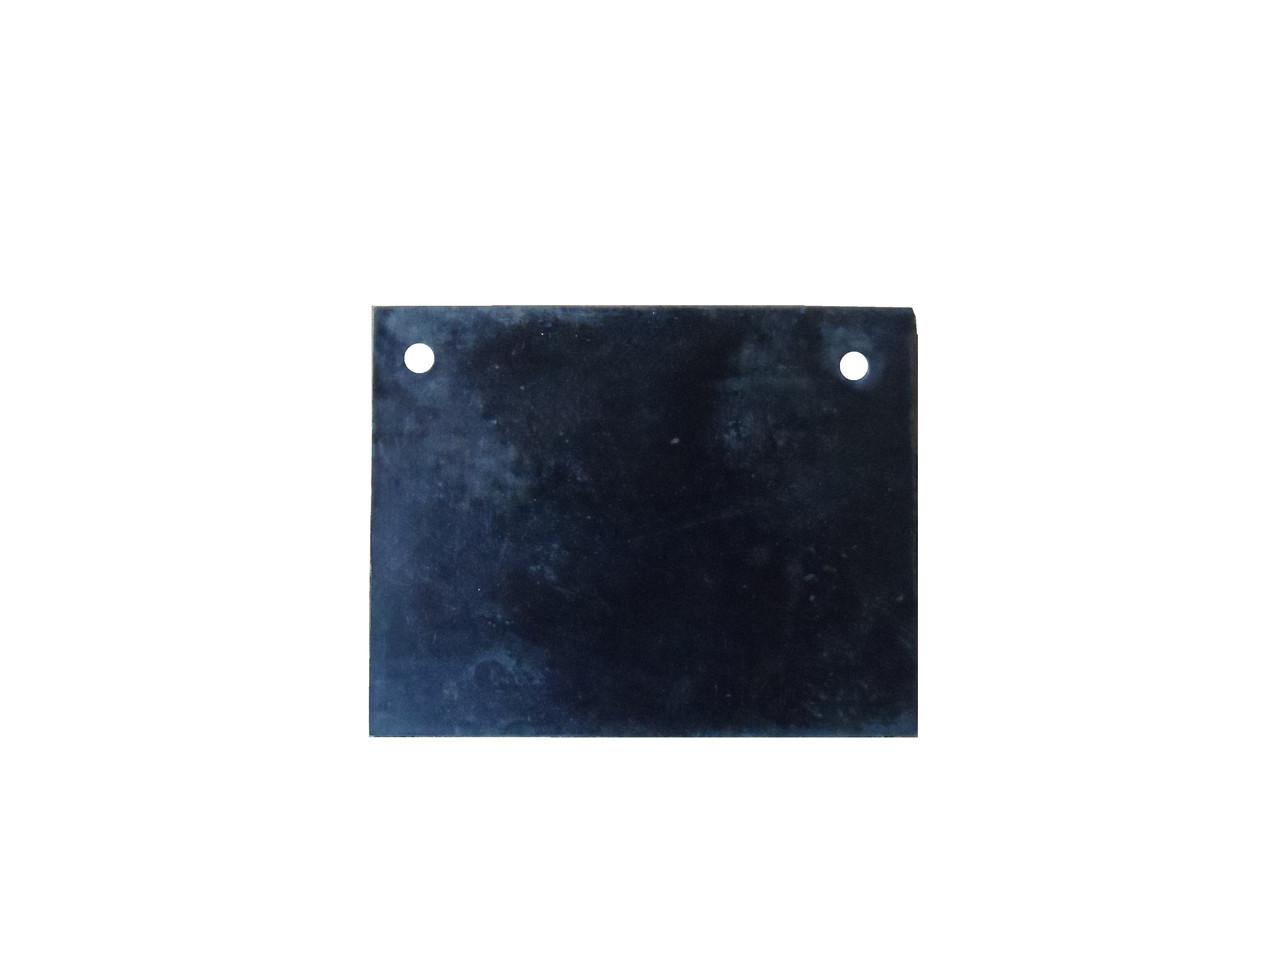 Лопатка широкая (130мм х 100мм) 02.102